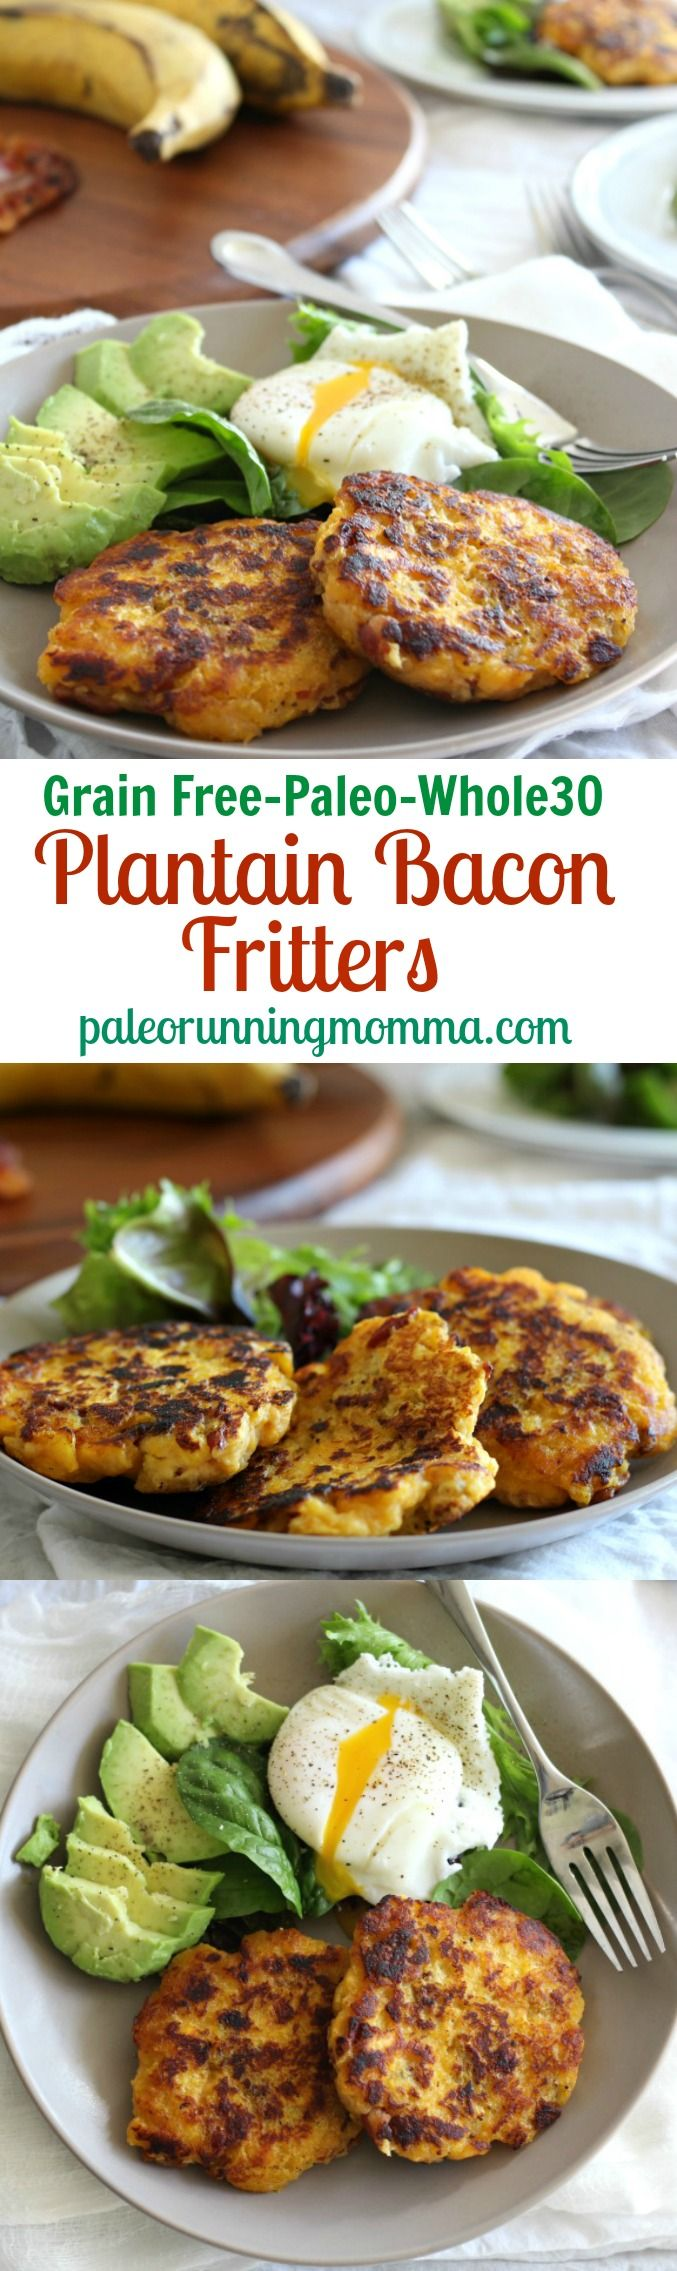 Plantain Bacon Fritters {Grain free, paleo, whole30}